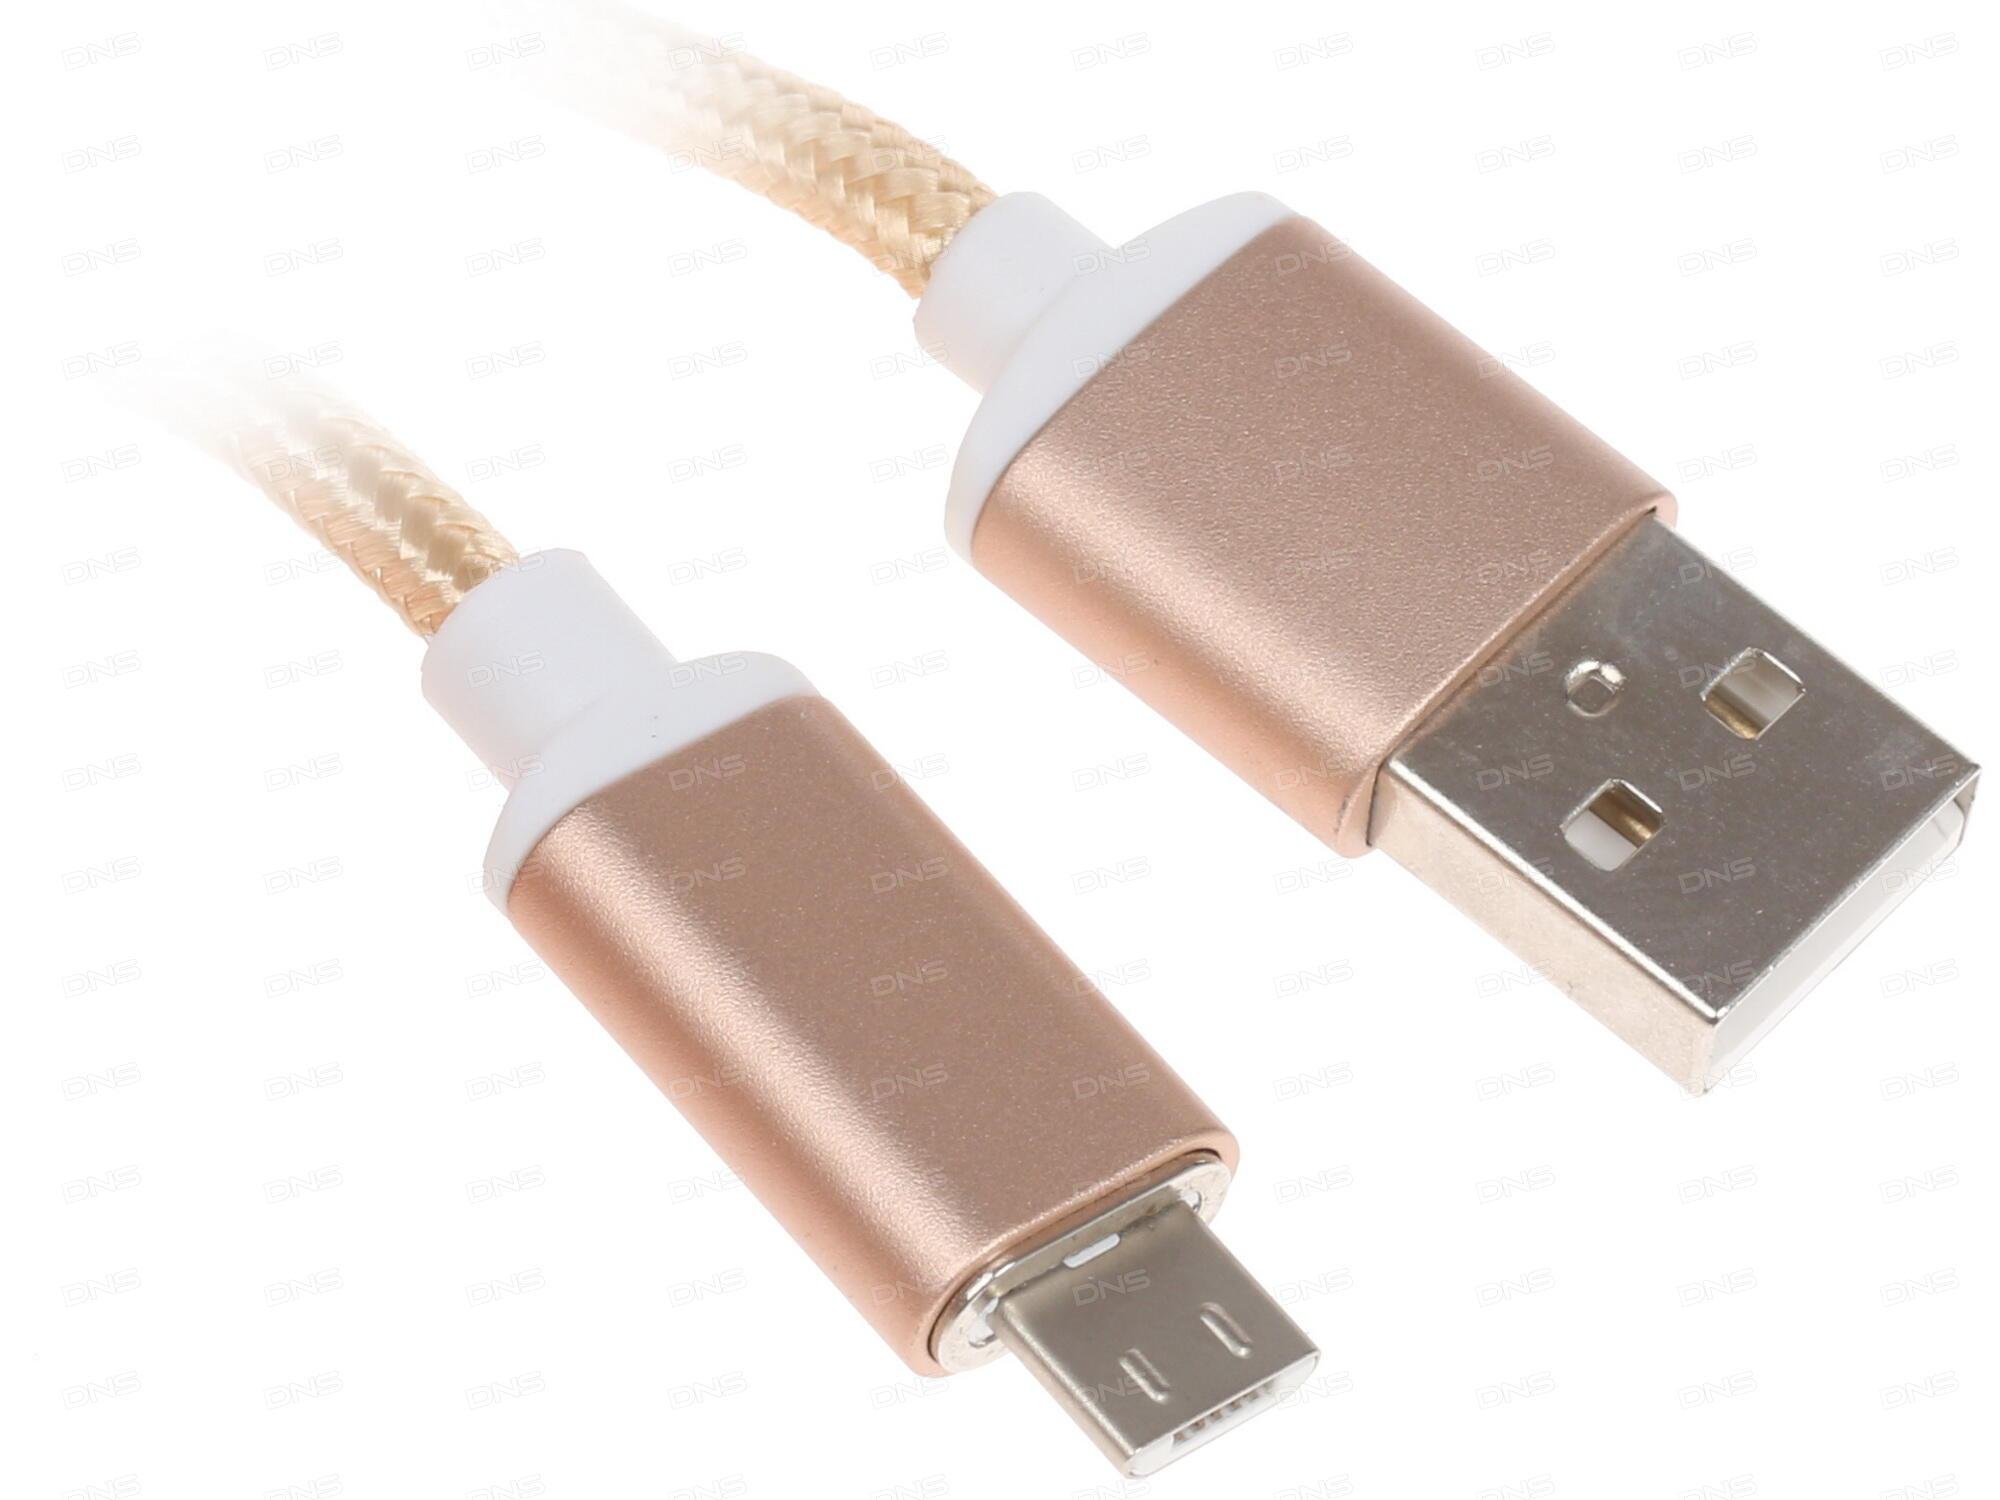 Кабель Lightning 8pin-USB Ritmix RCC-221 Black для синхронизации/зарядки 1м ткан. опл.